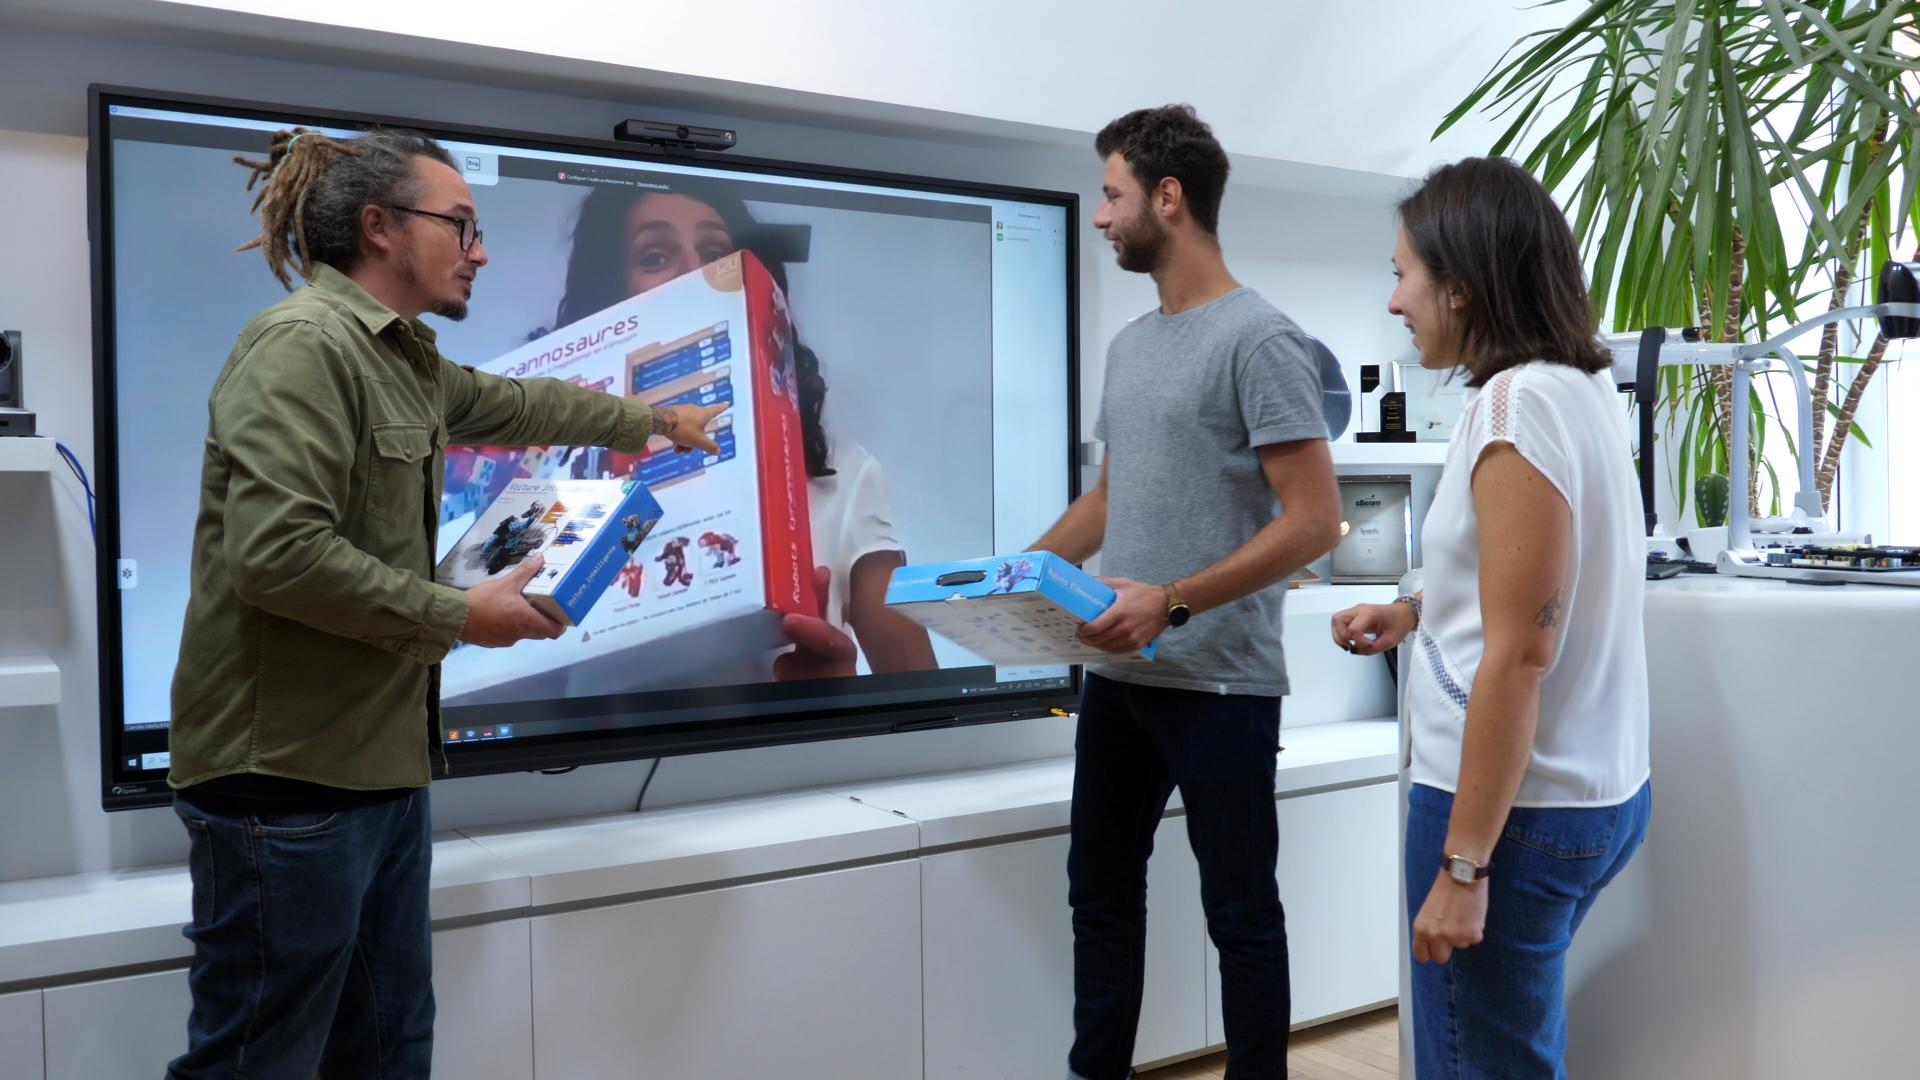 écran interactif en visioconférence